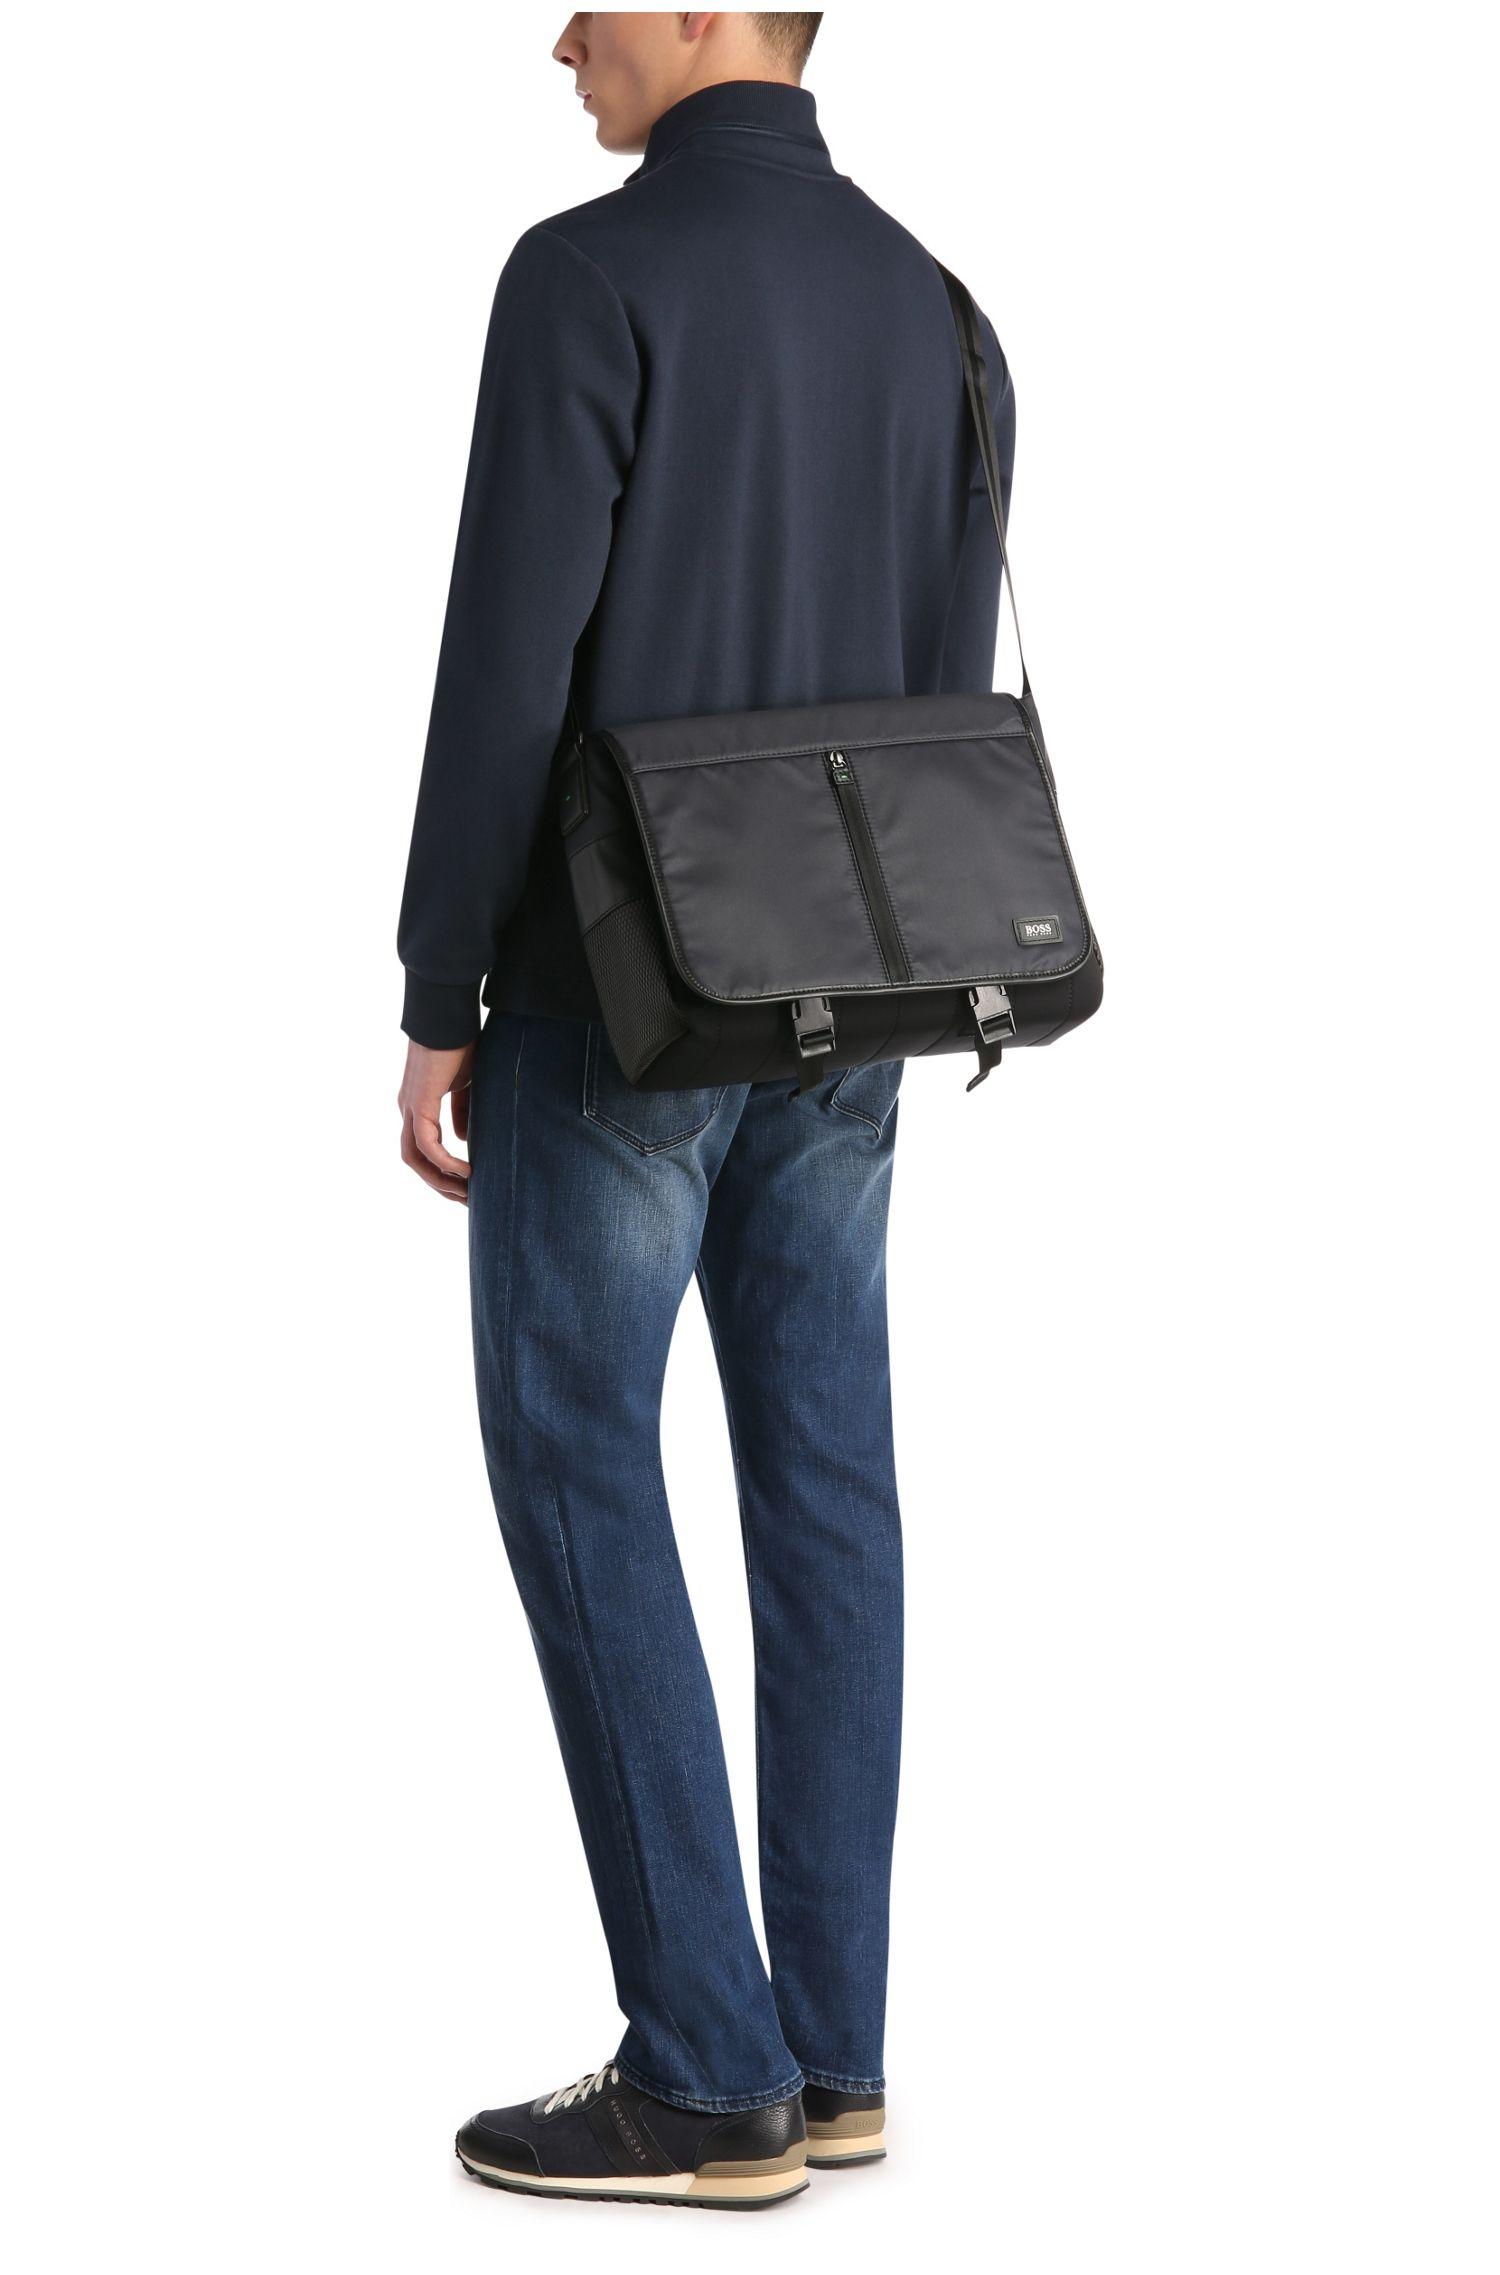 Messenger-Tasche aus Nylon: ´Mission_Mess flap`